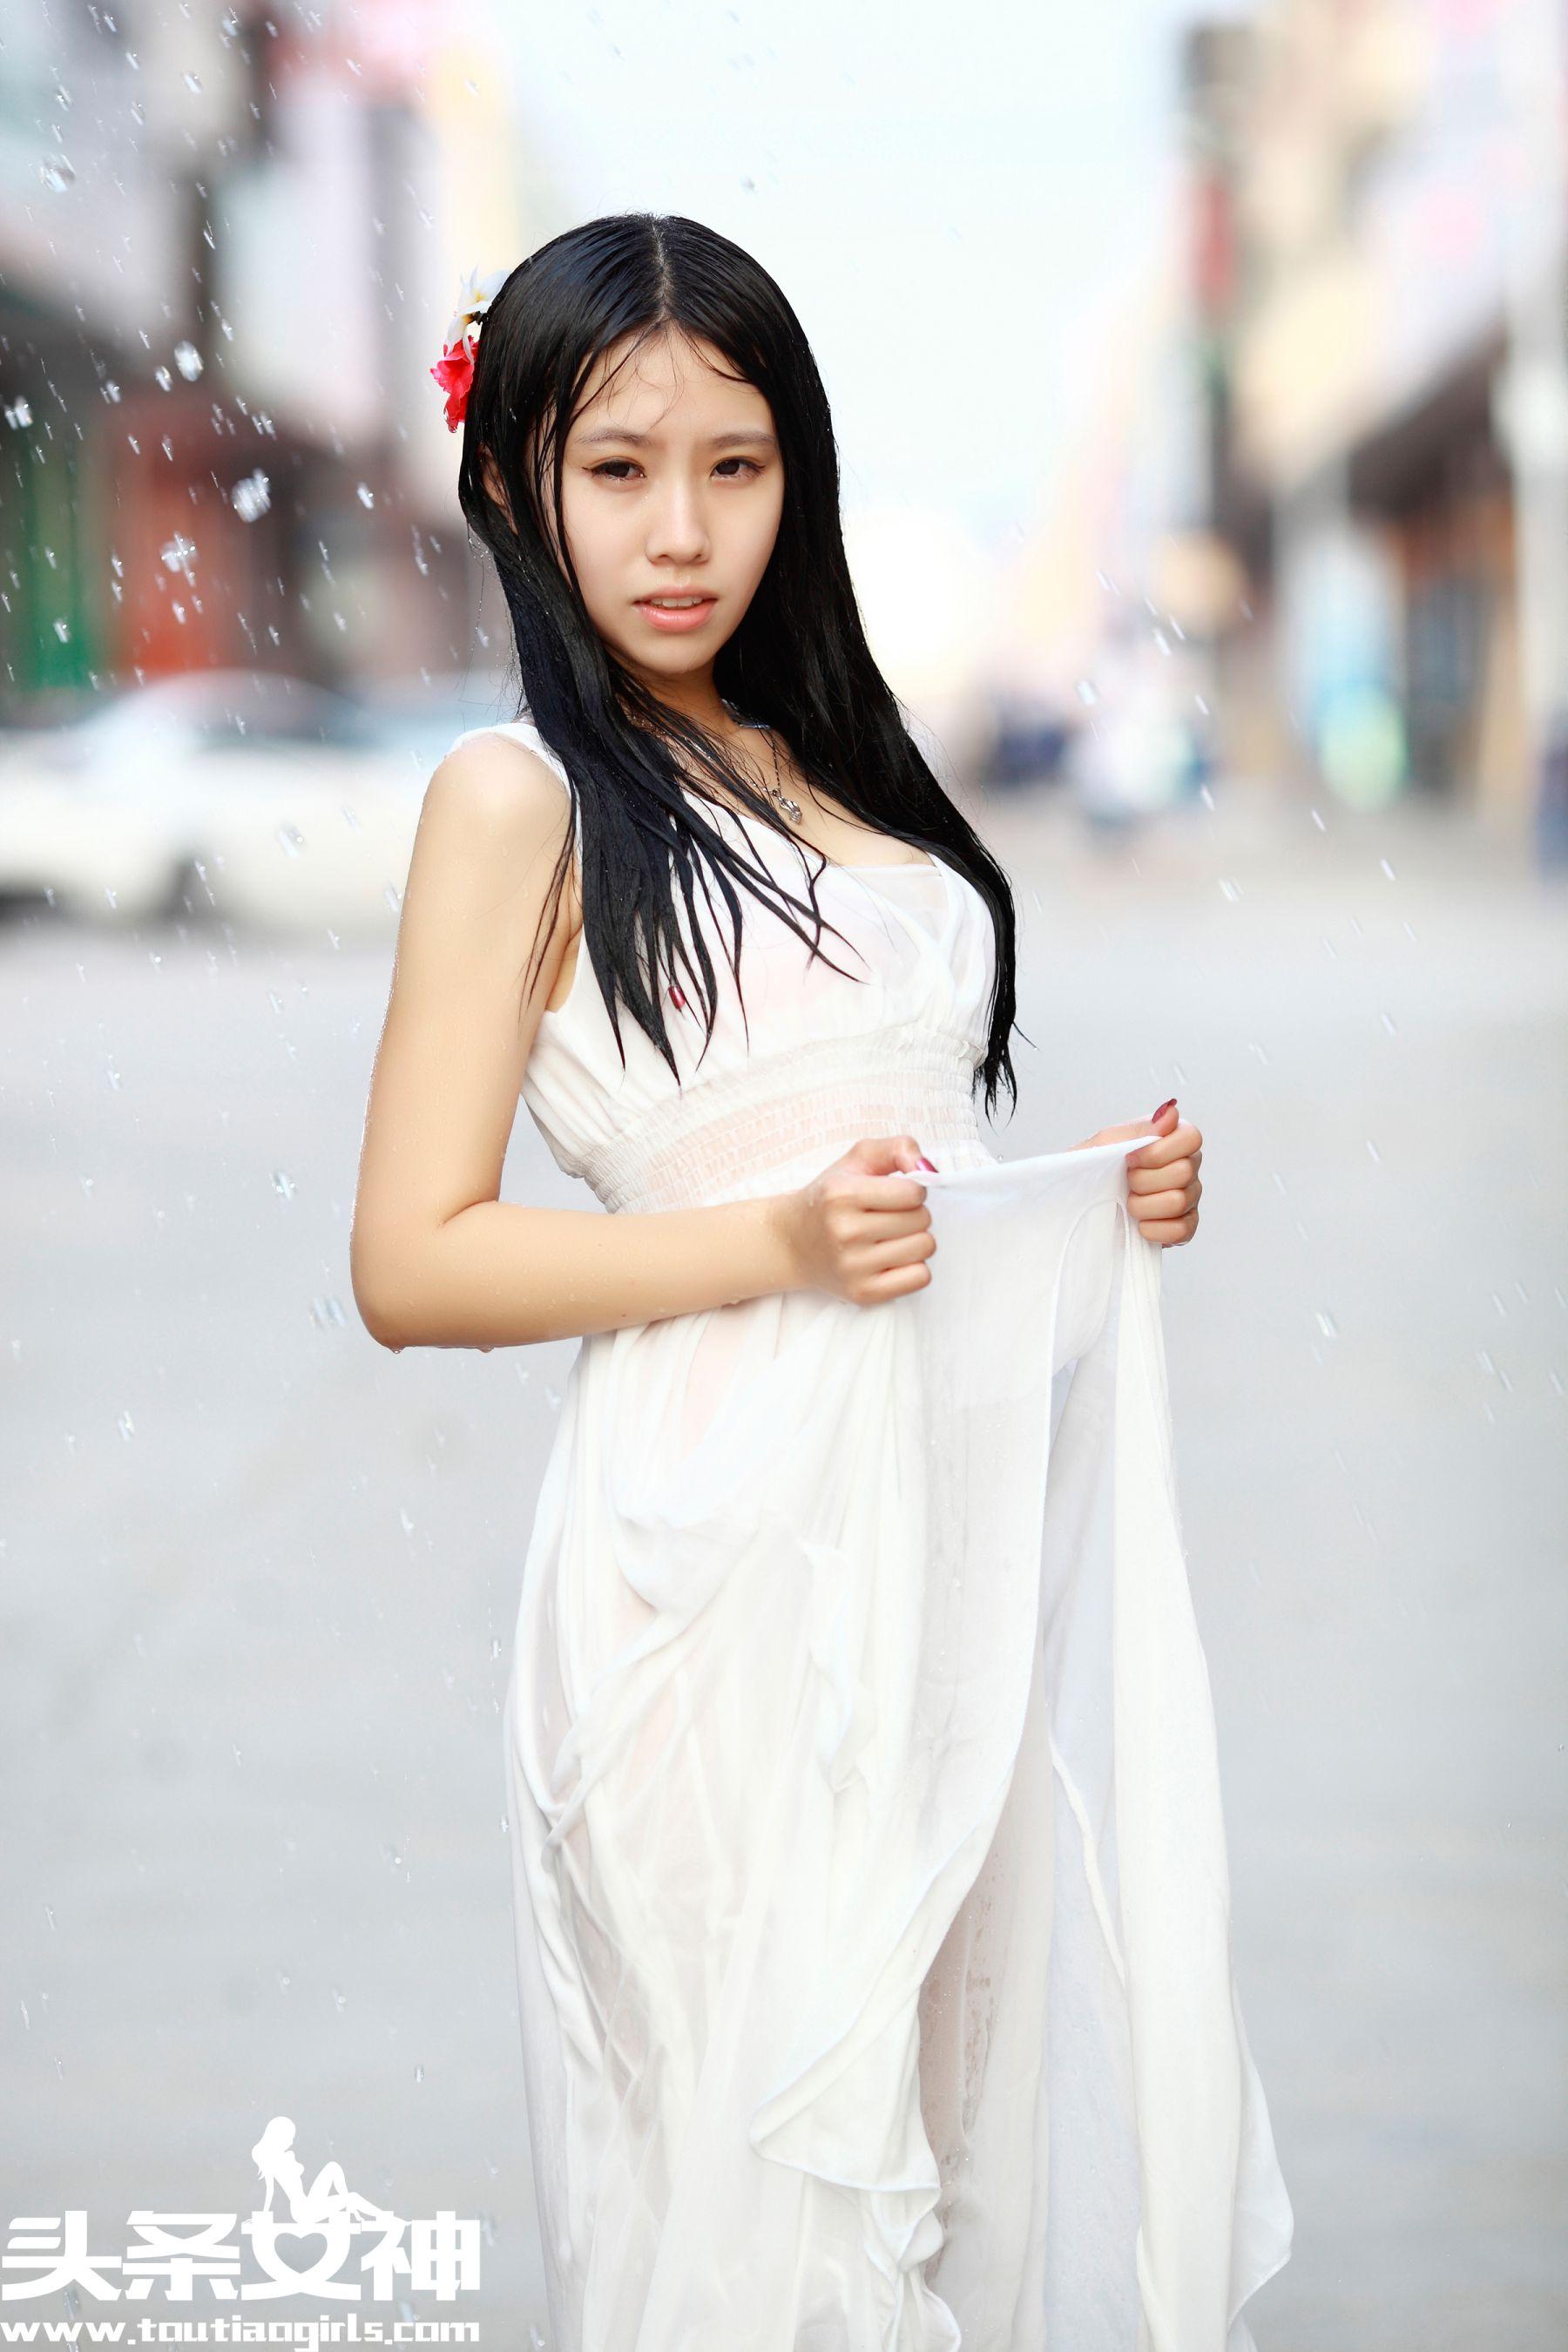 [TouTiao头条女神] No.087 琪琪 - 异域萝莉[43P]